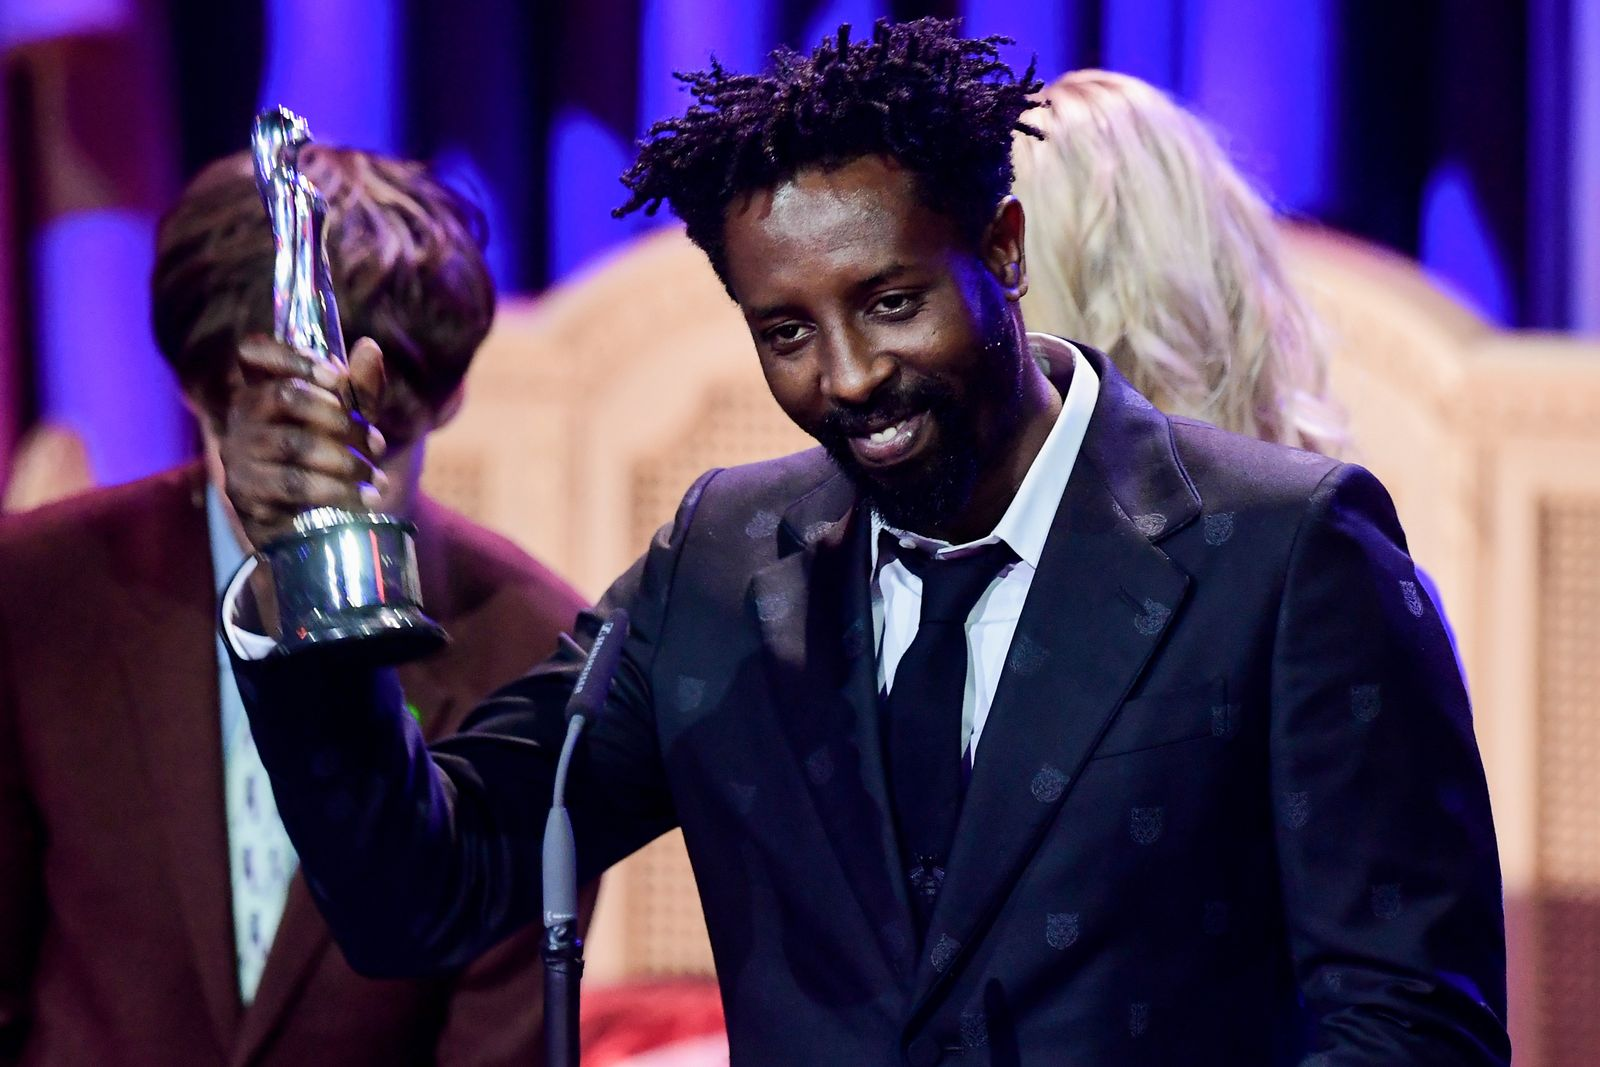 European Film Awards 2019